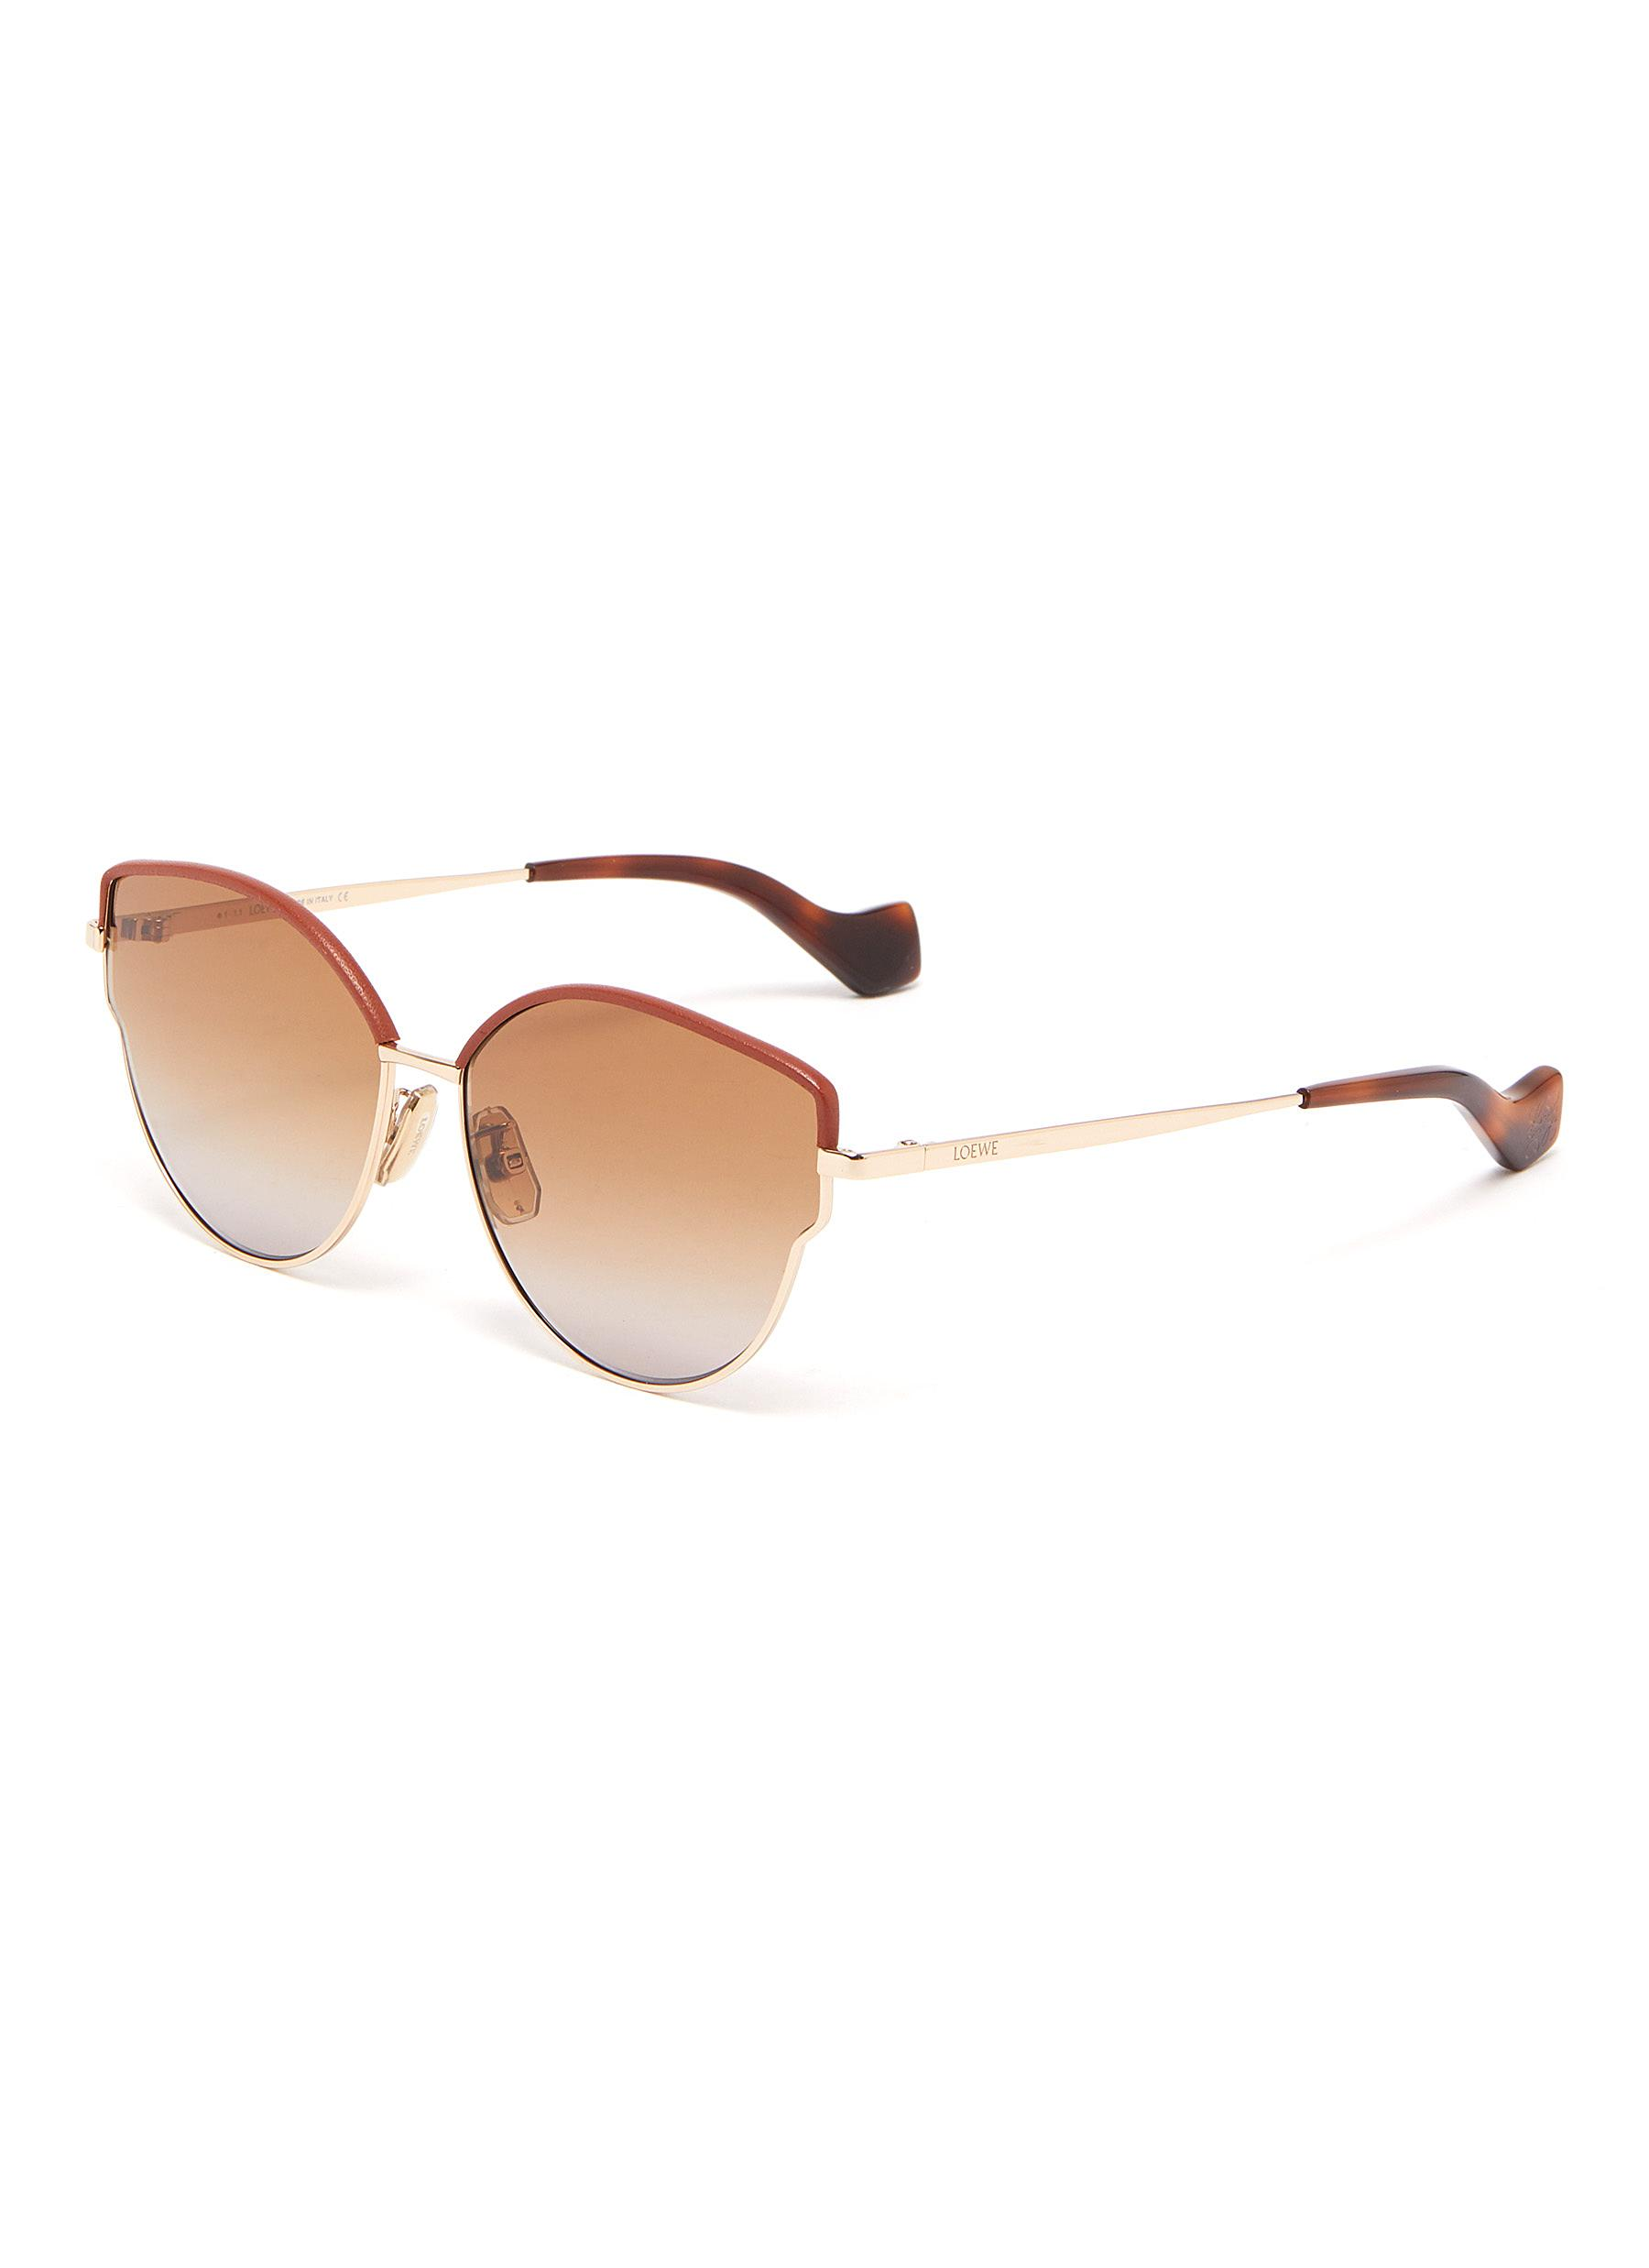 Loewe Sunglasses LEATHER BROWLINE BUTTERFLY SUNGLASSES